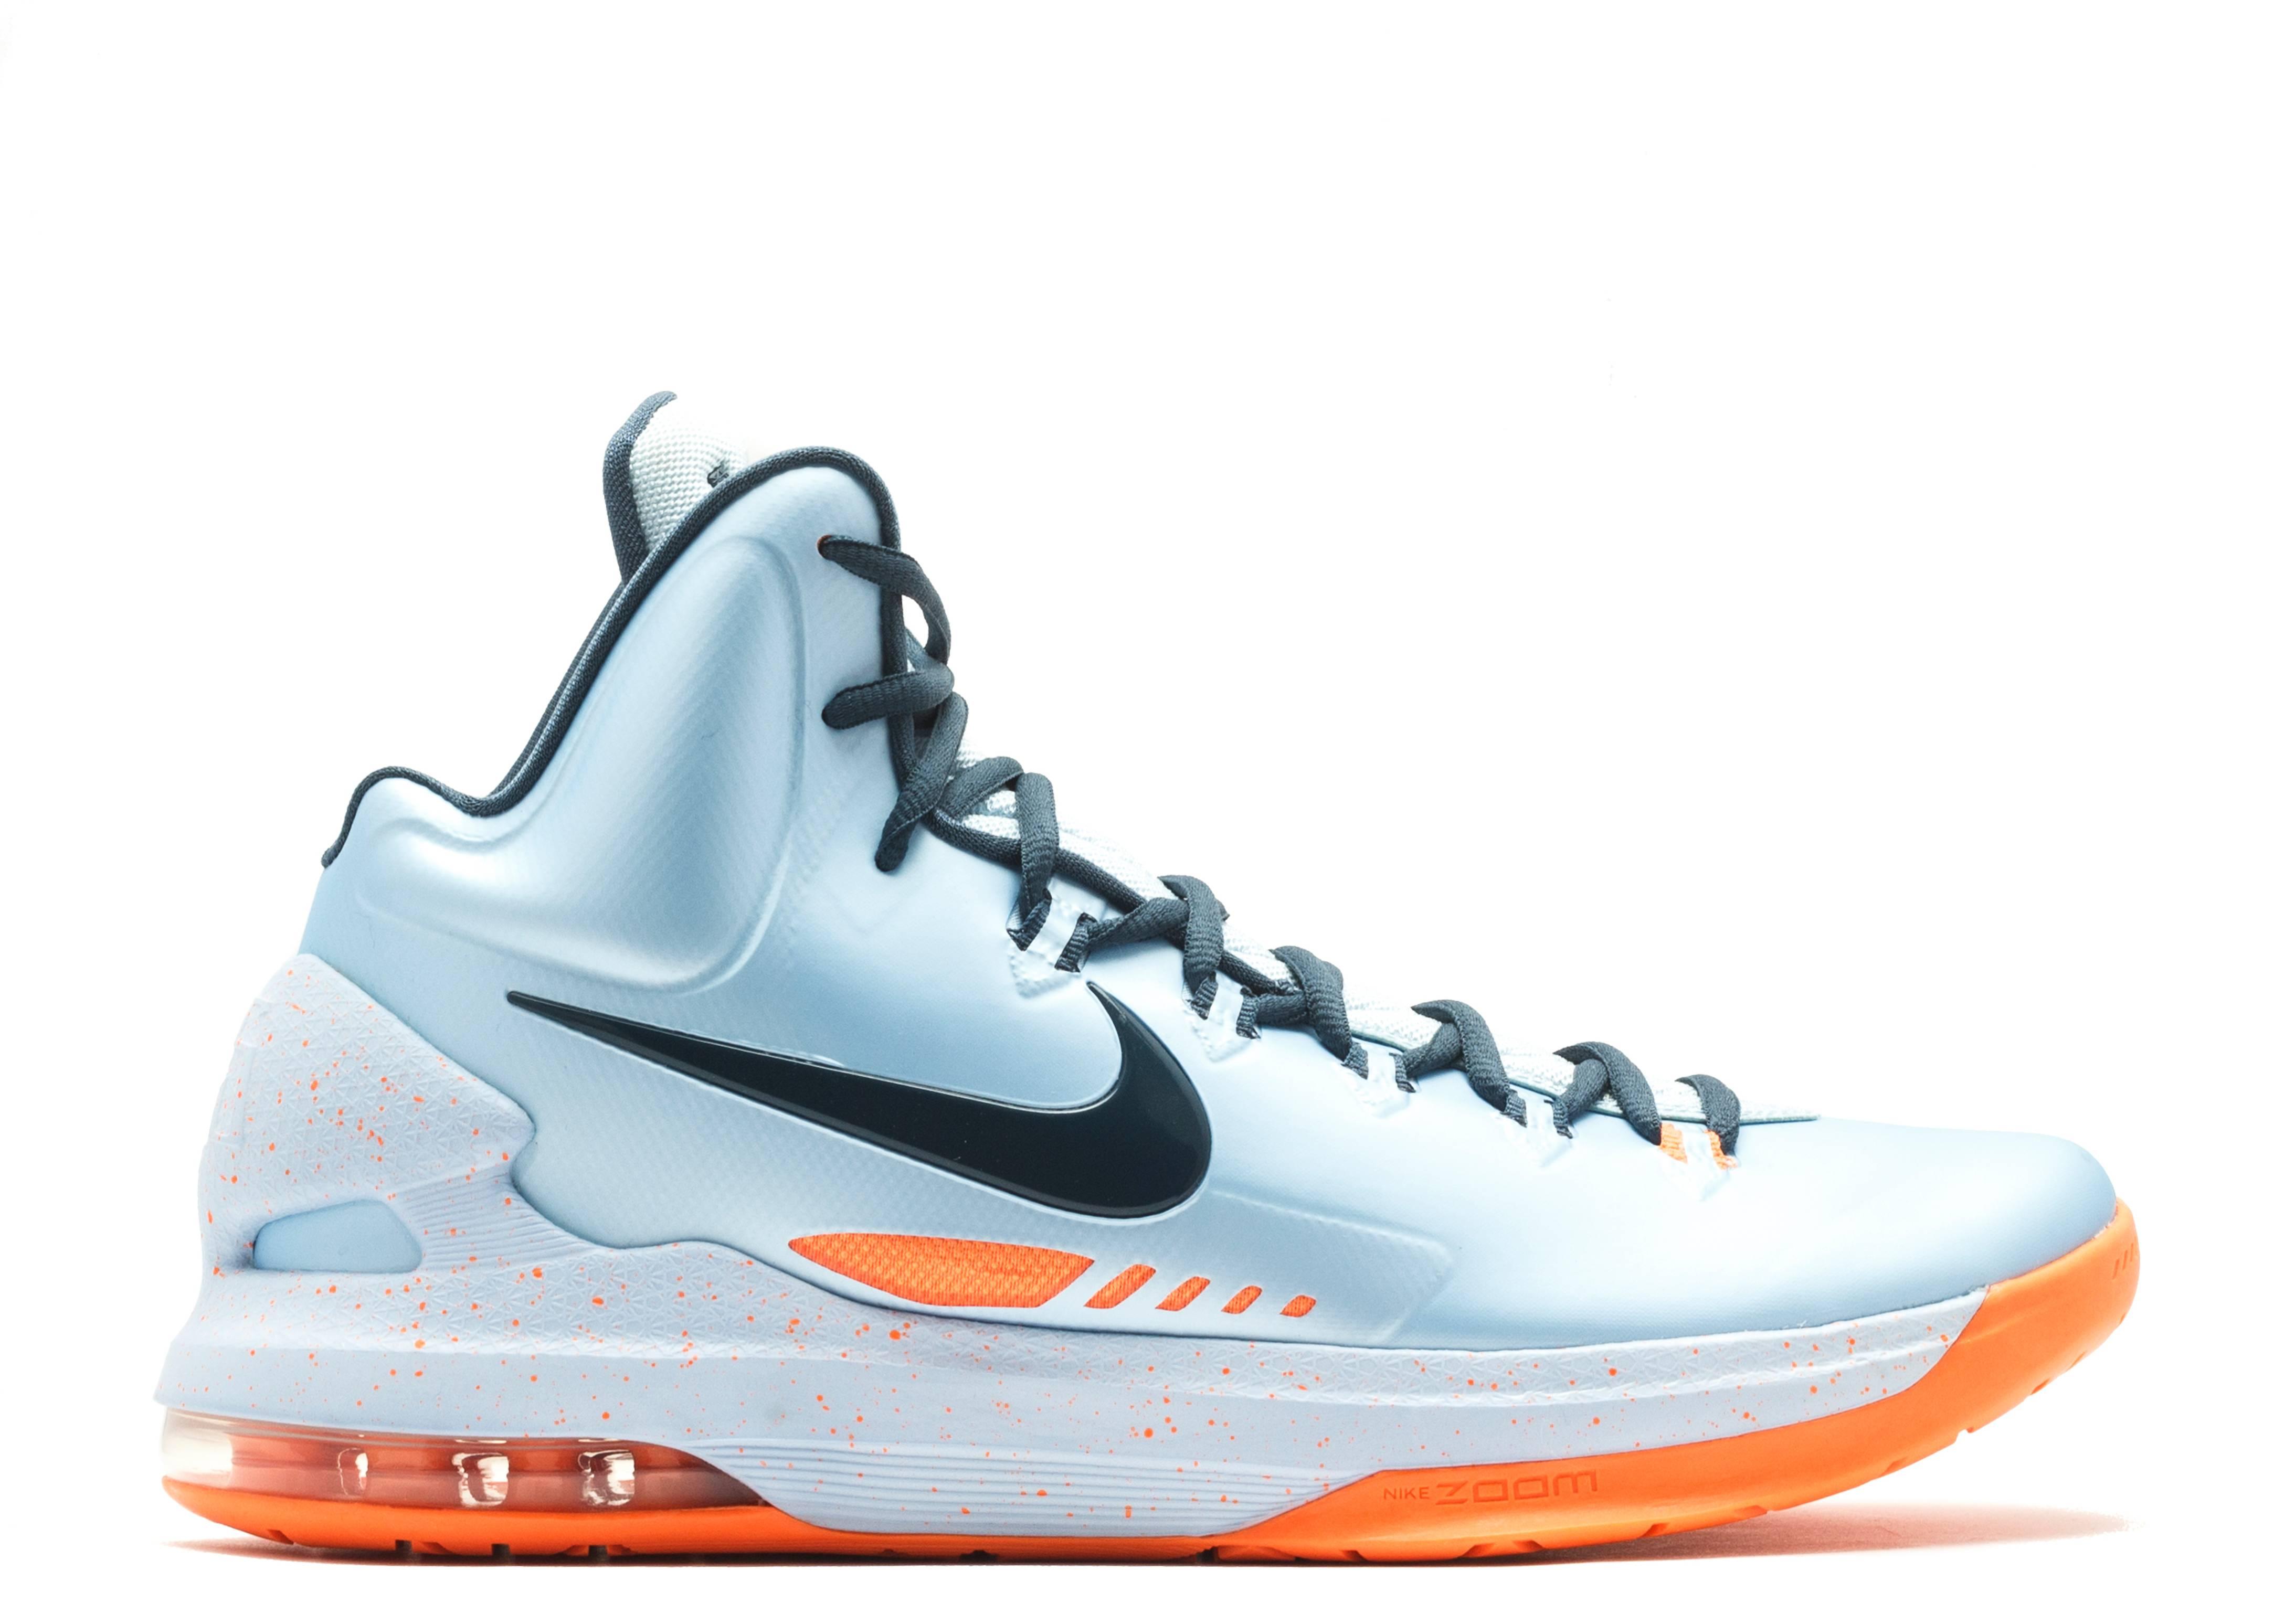 38e92b798b85 Kd V - Nike - 554988 400 - ice blue sqdrn blue-ttl orng